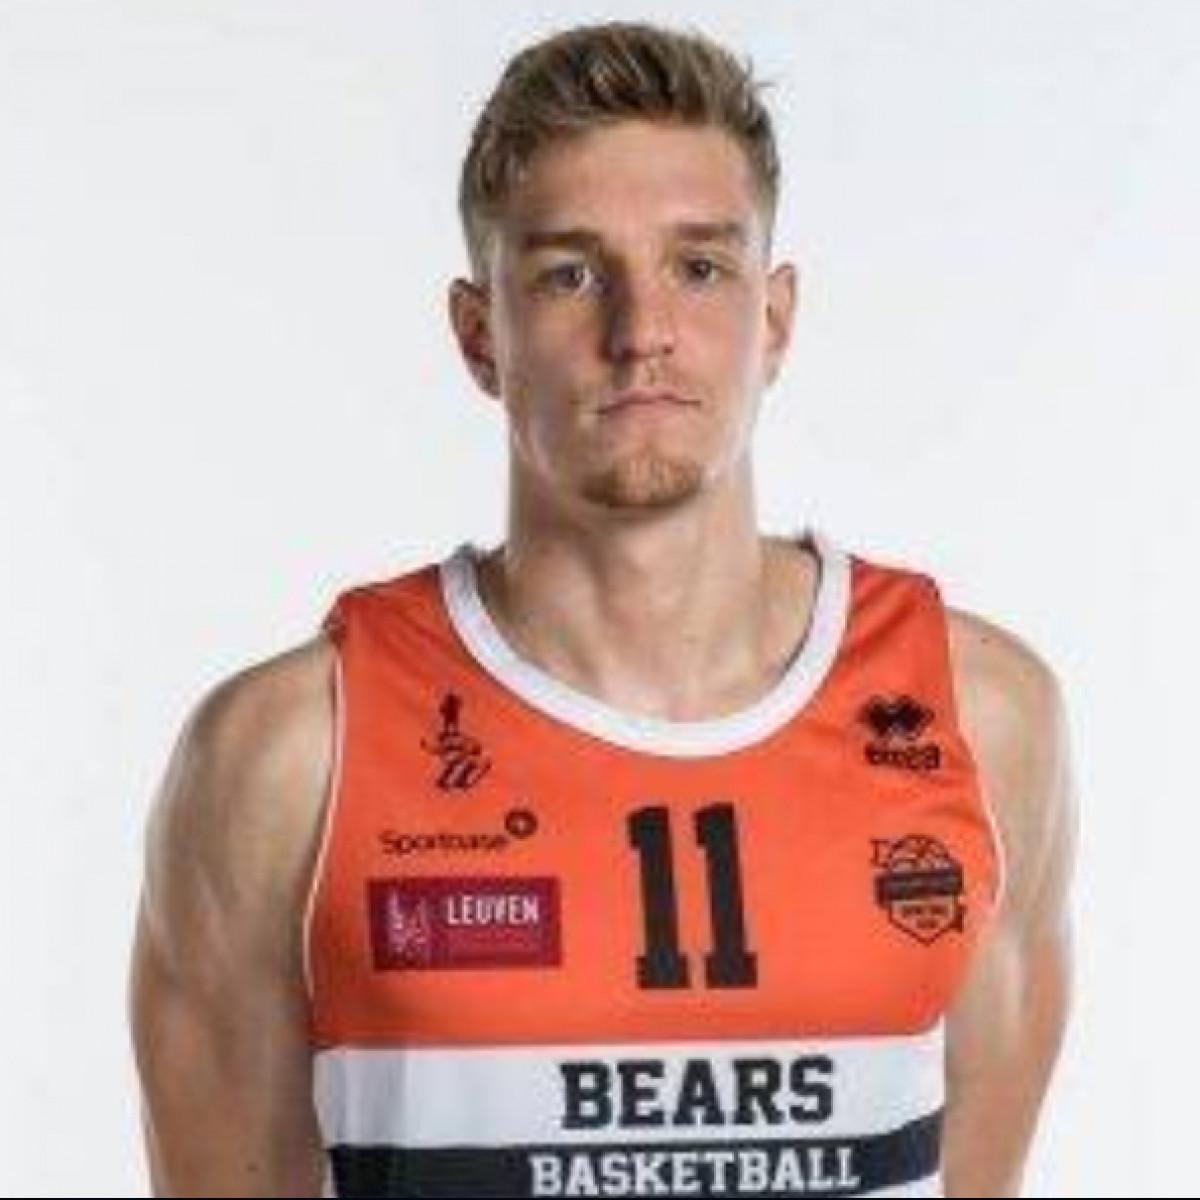 Photo of Seppe D'espalier, 2018-2019 season